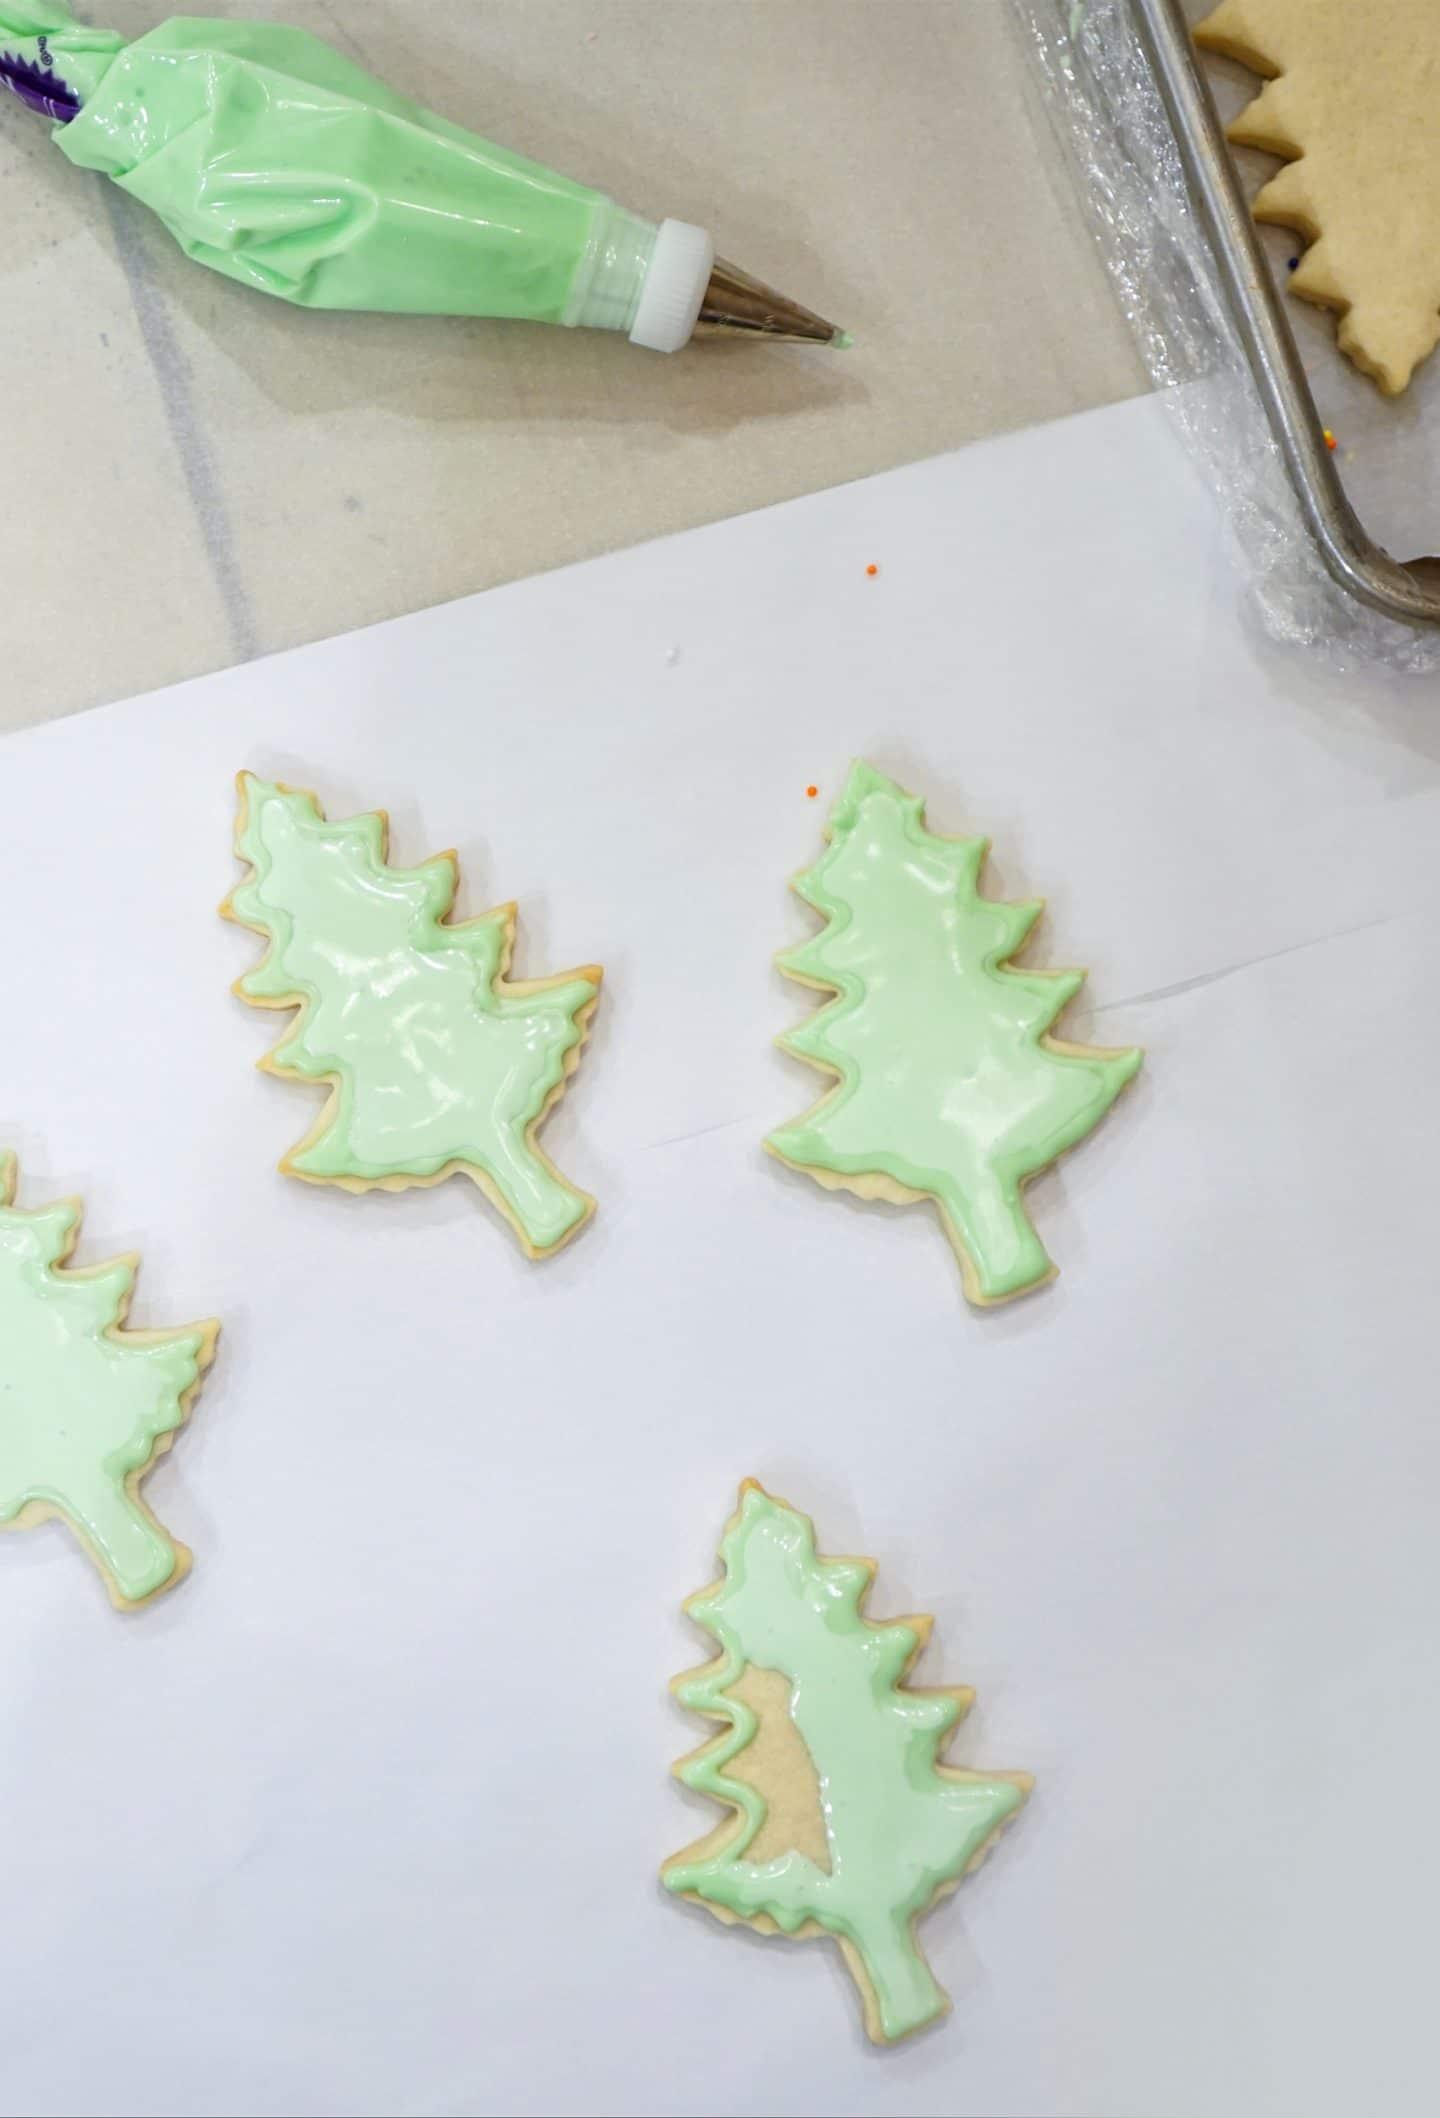 Cut Out Sugar Cookie Recipe | Blogger Ashley Brooke | www.ashleybrookedesigns.com